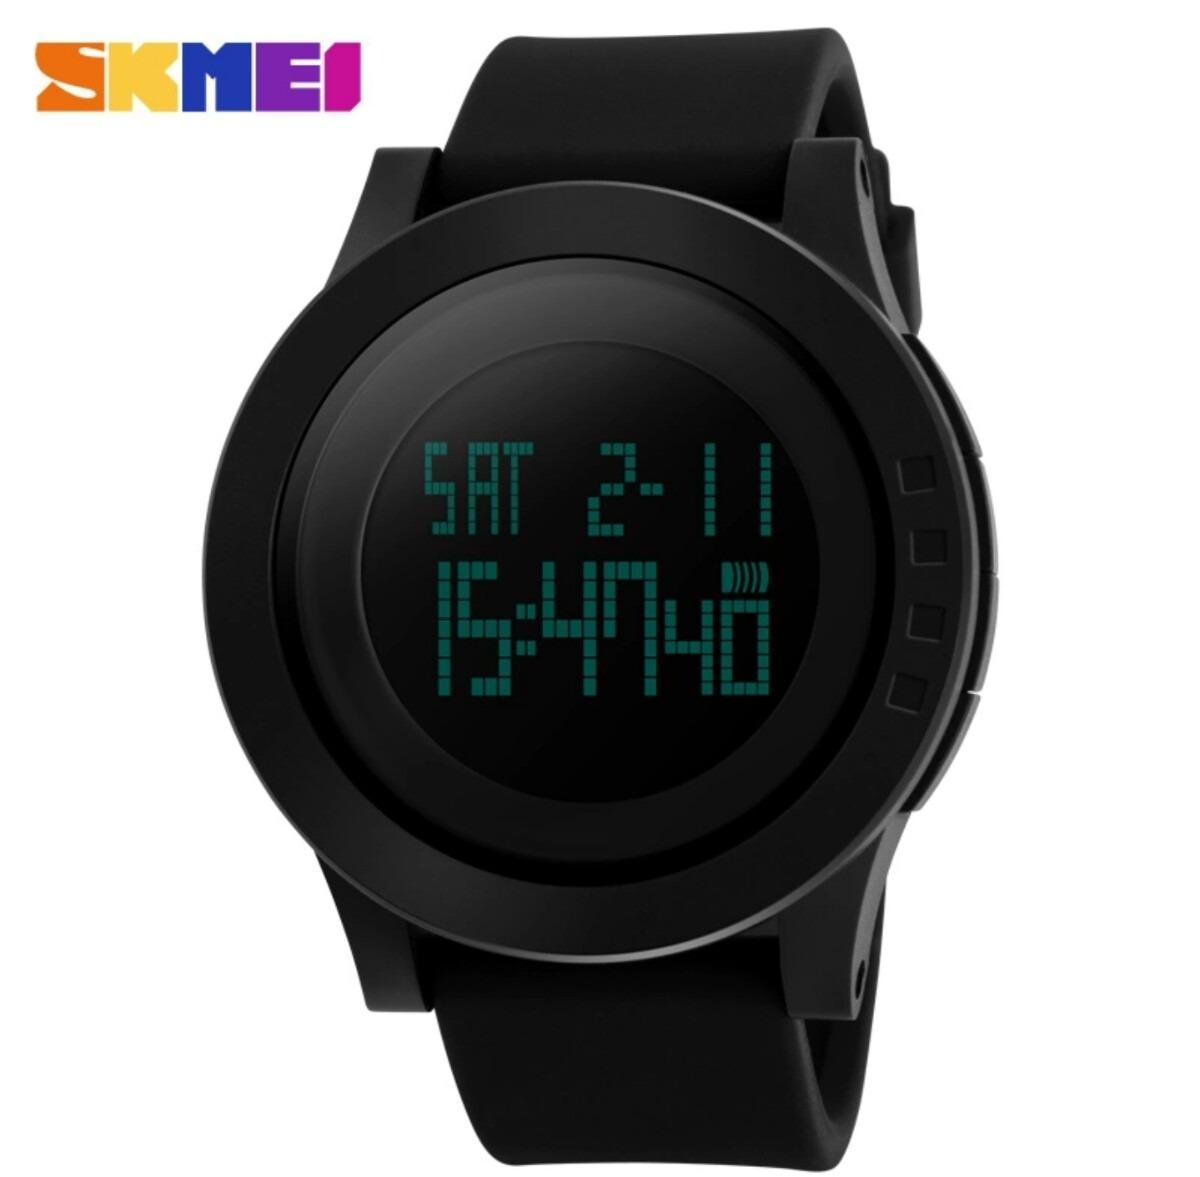 14347d4ce5f relógio digital masculino redondo grande aprova d água preto. Carregando  zoom.